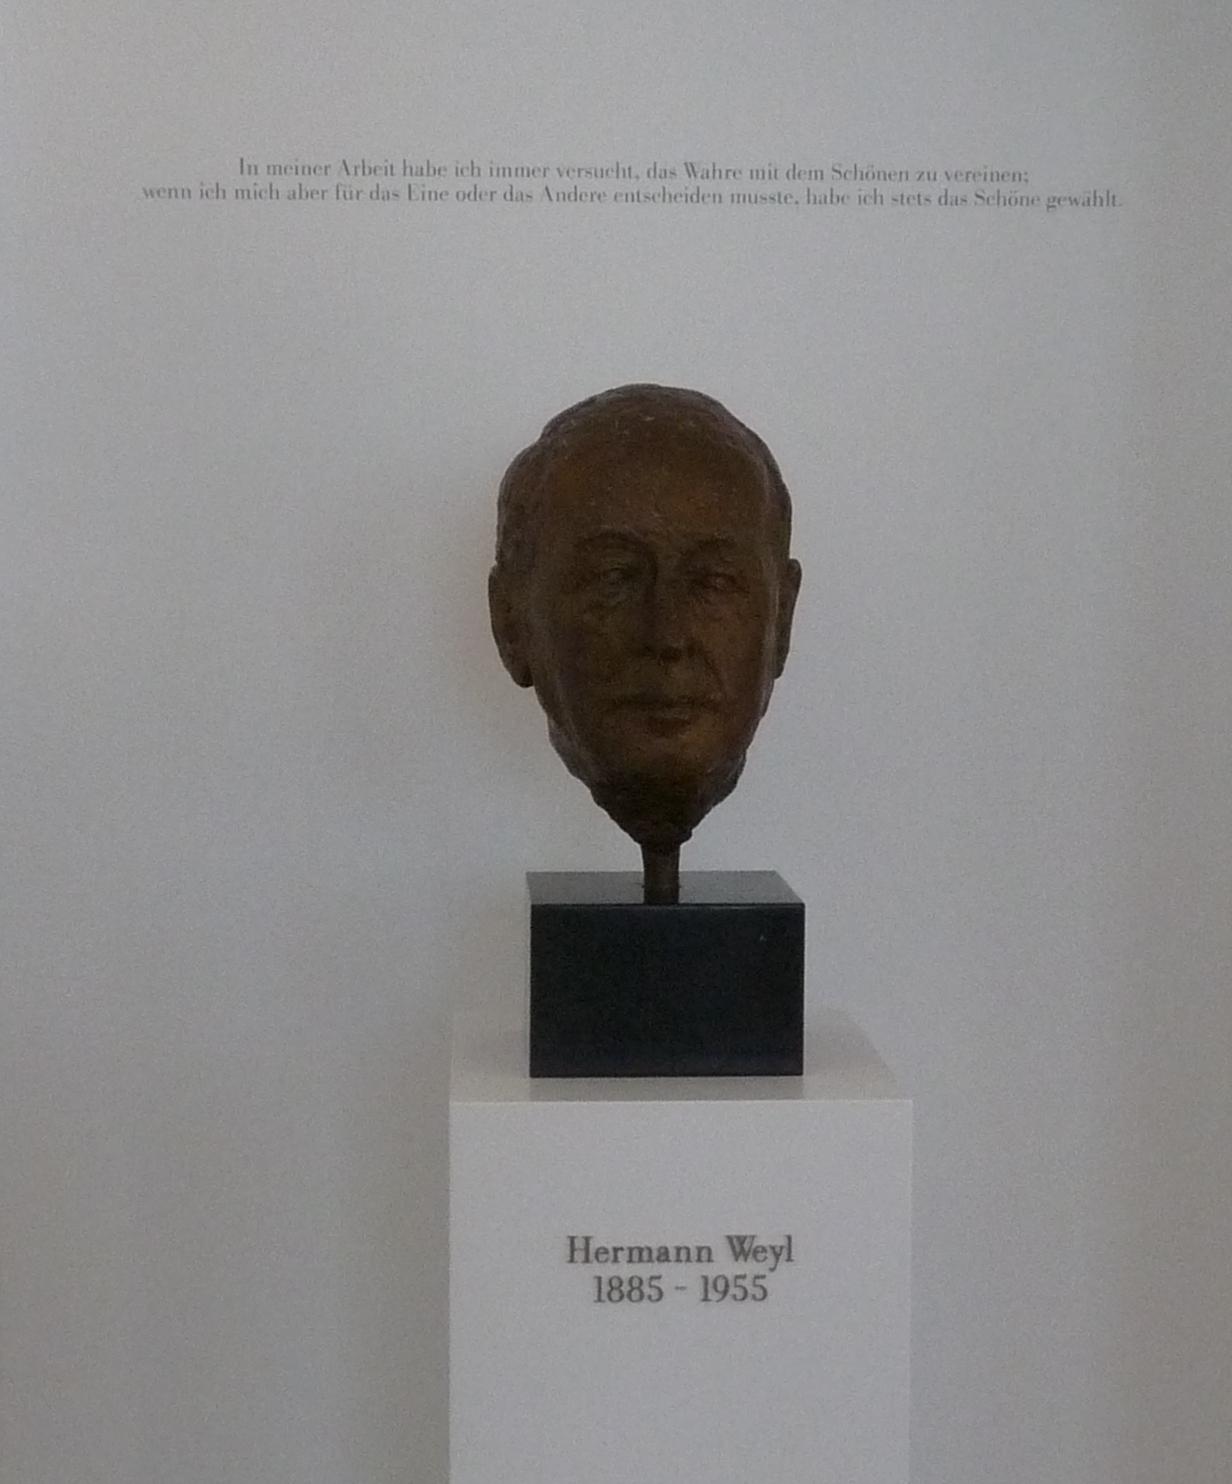 Hermann Weyl's quote #1